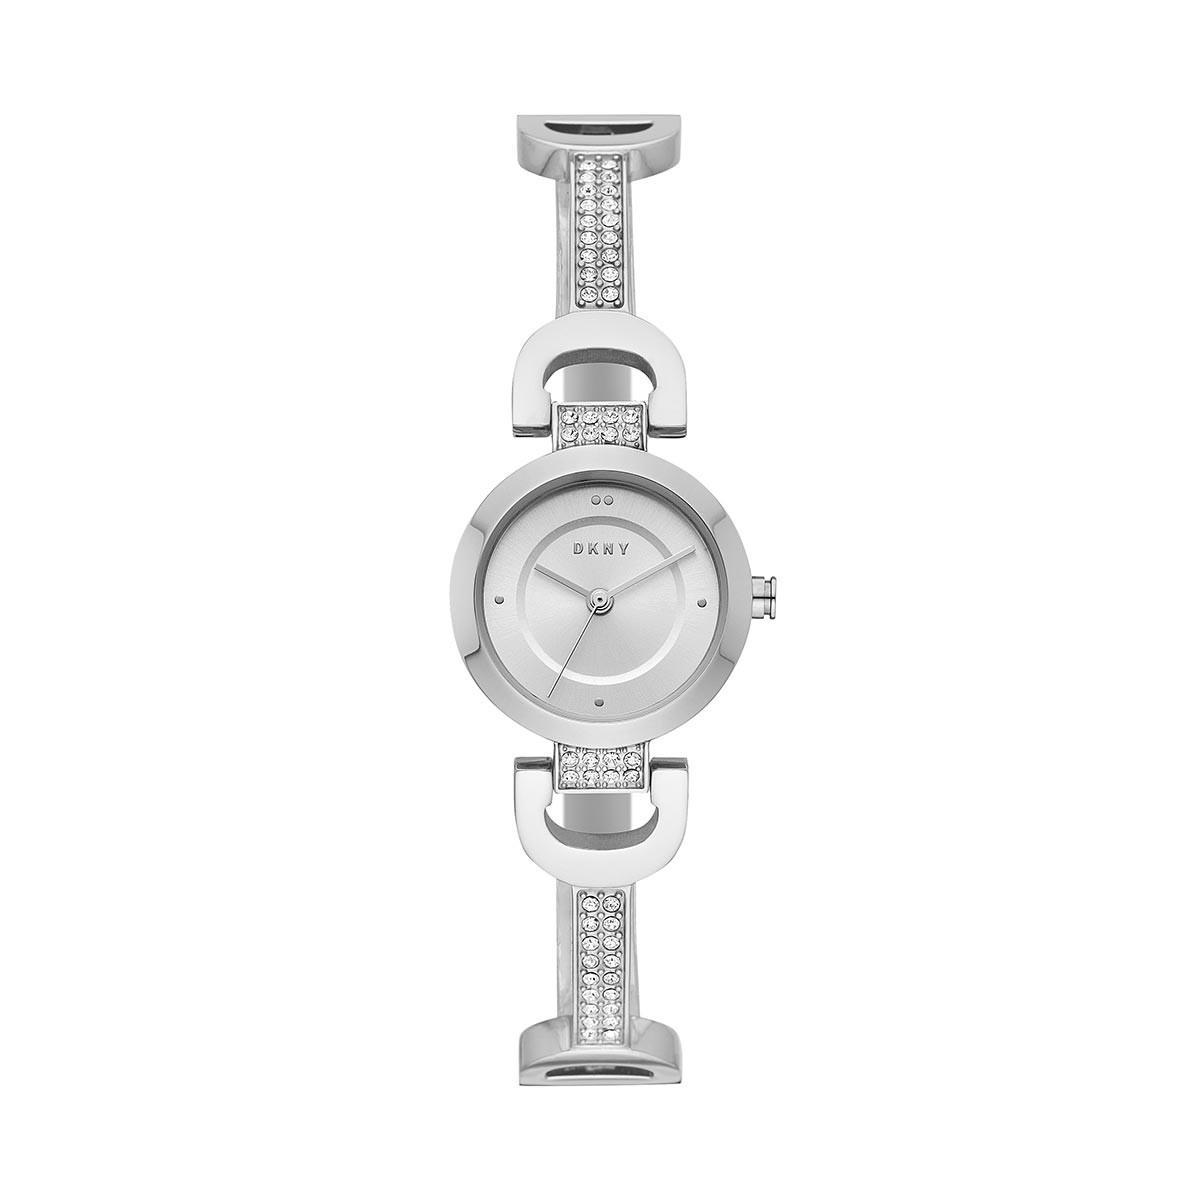 DKNY Uhr - NY2751 City Link Watch Silver - in silber - für Damen